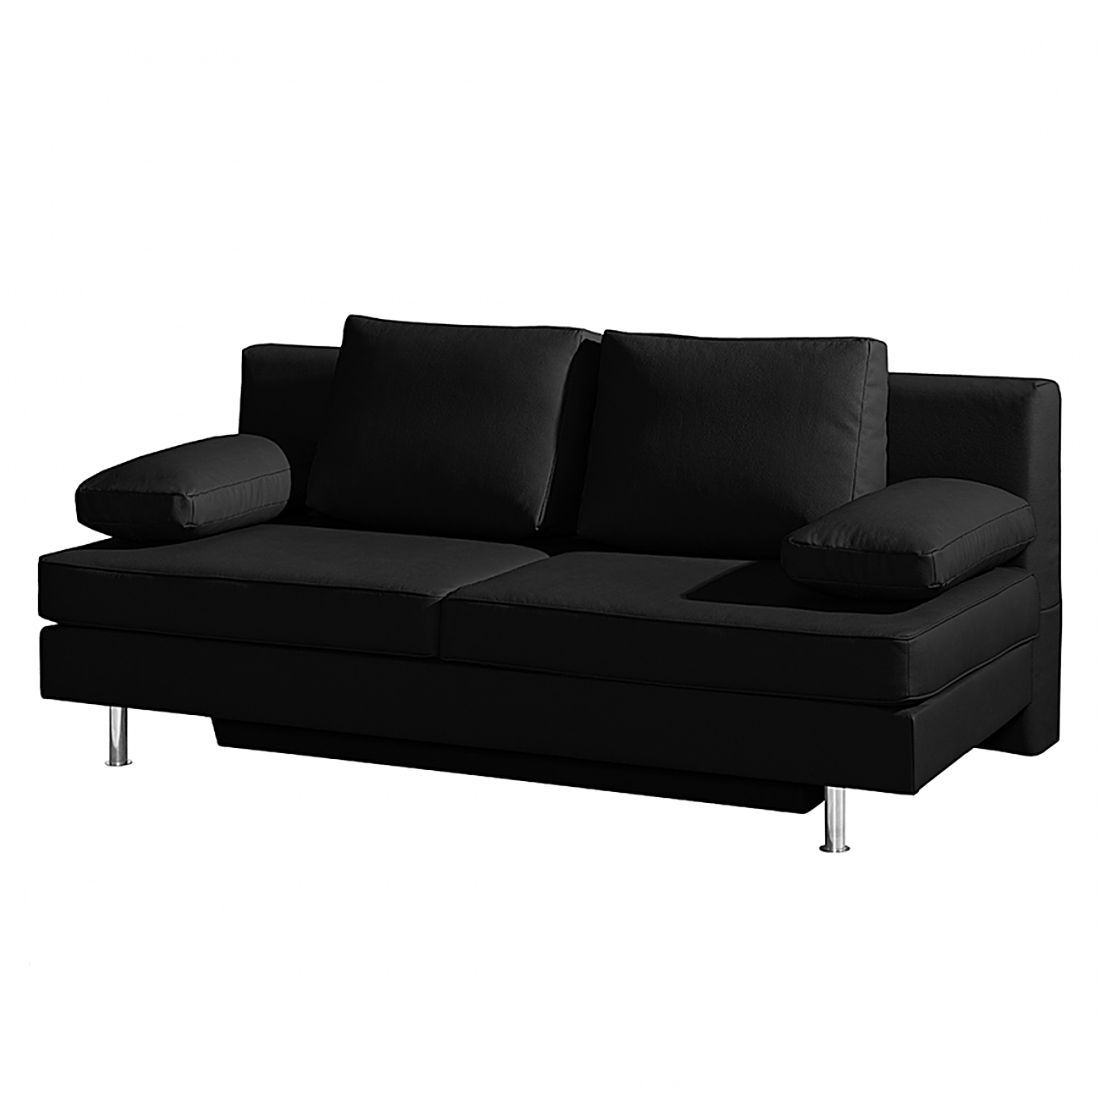 goedkoop Slaapbank Emmanuela zwart kunstleer roomscape